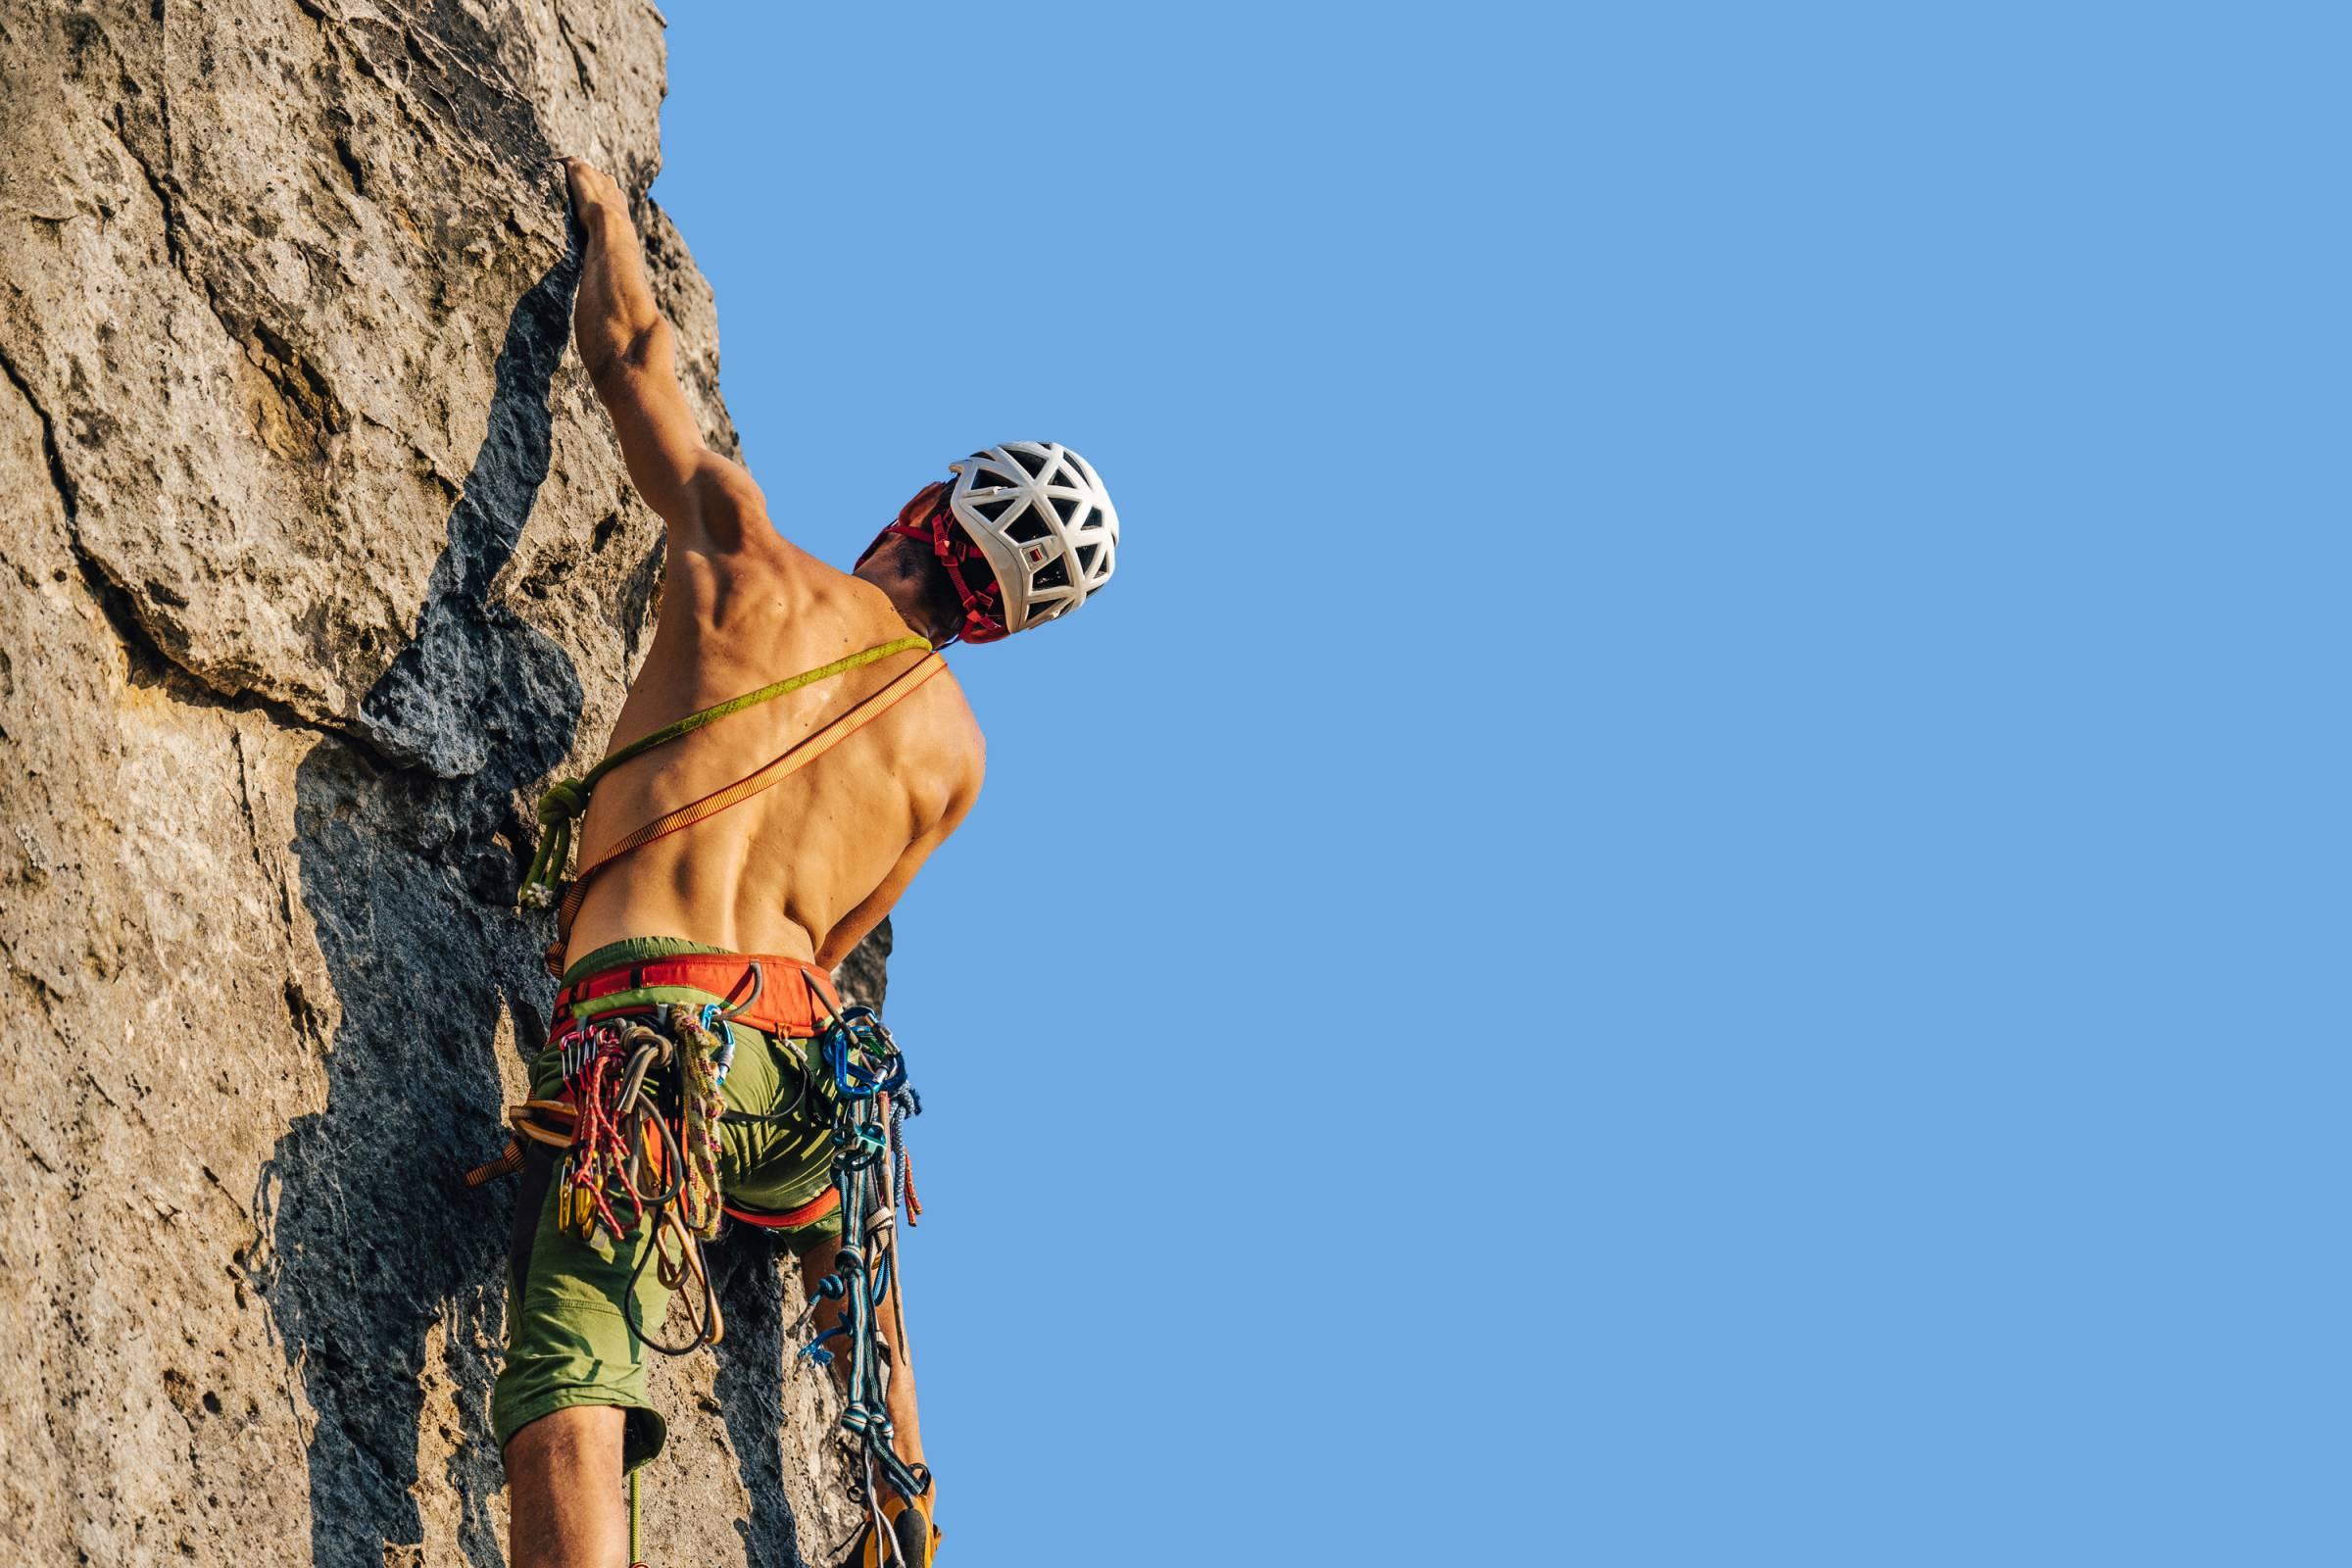 Climber on Sandstone